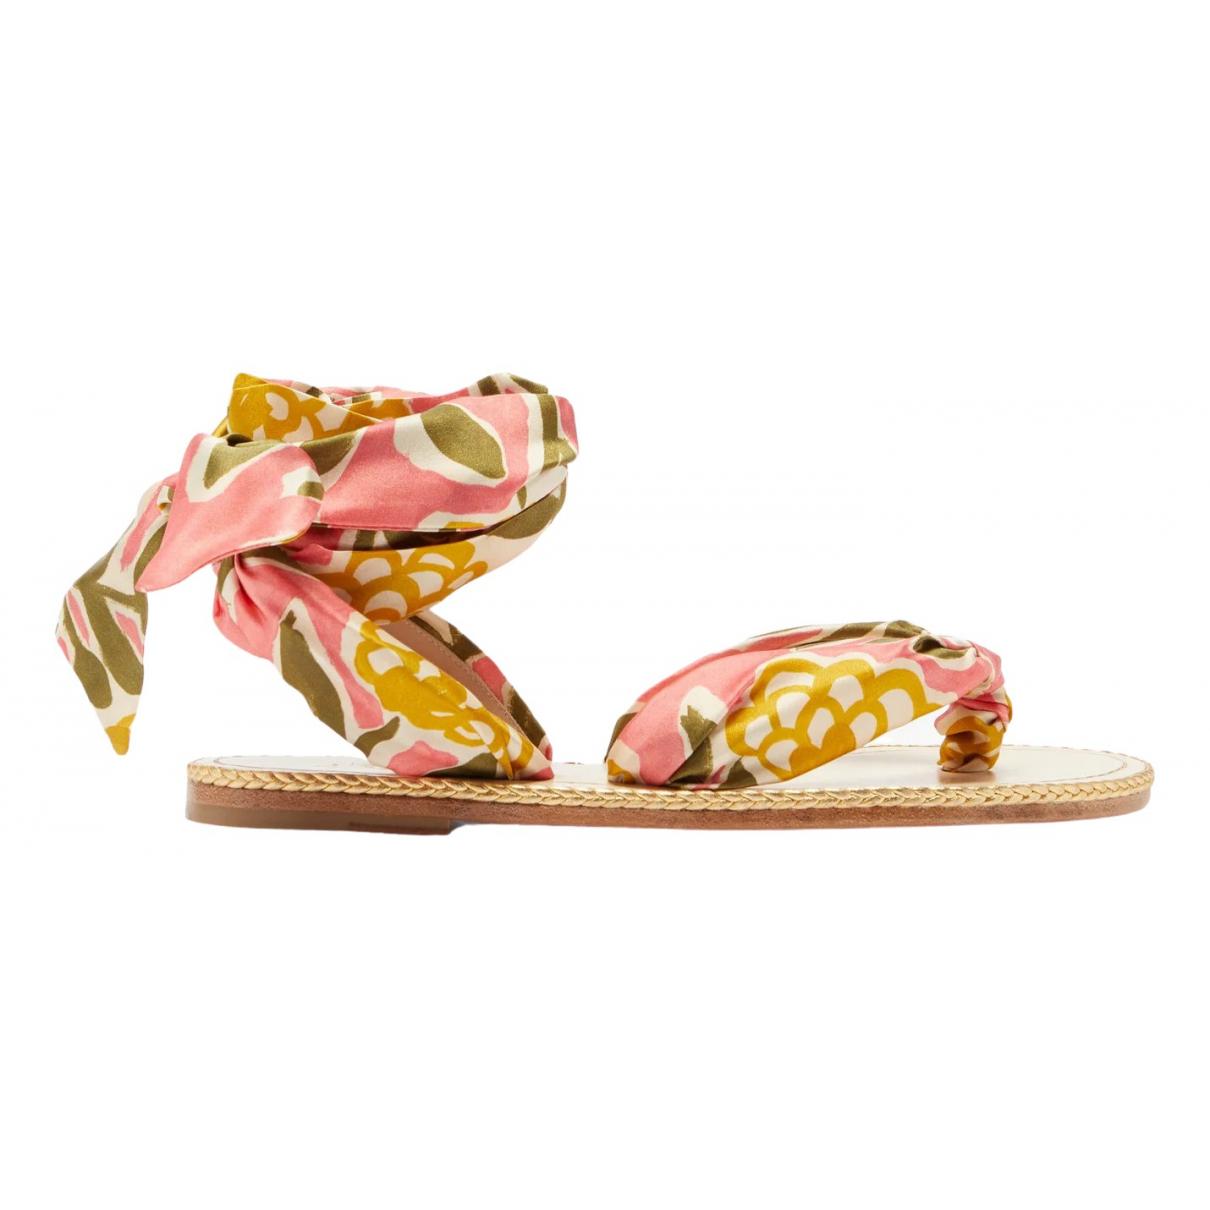 Sandalias de Lona Christian Louboutin